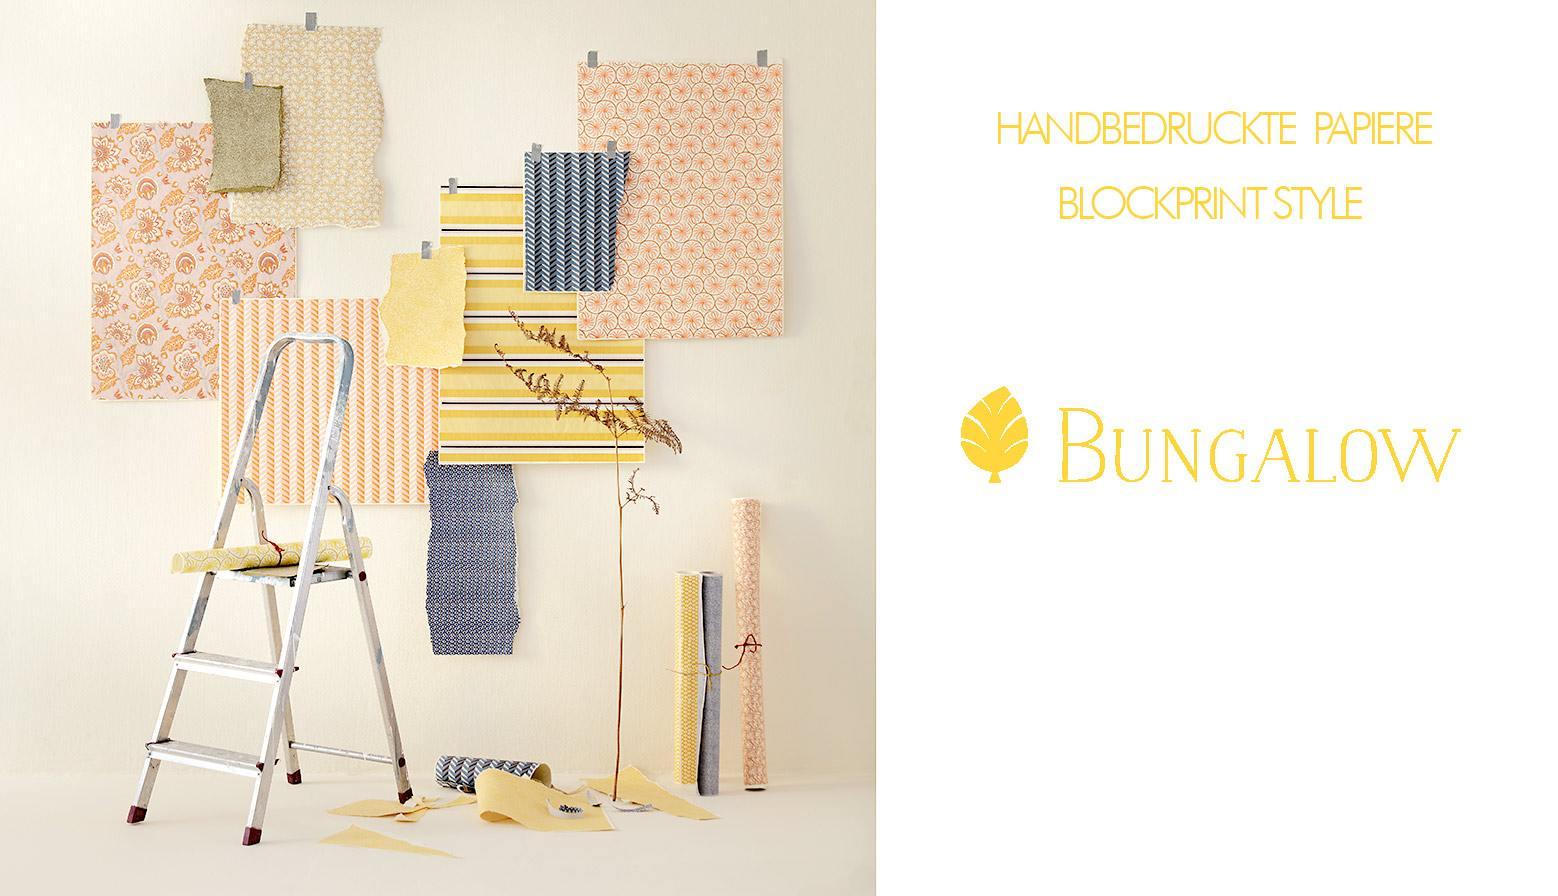 bungalow dk papiere muster wunderschoen-gemacht